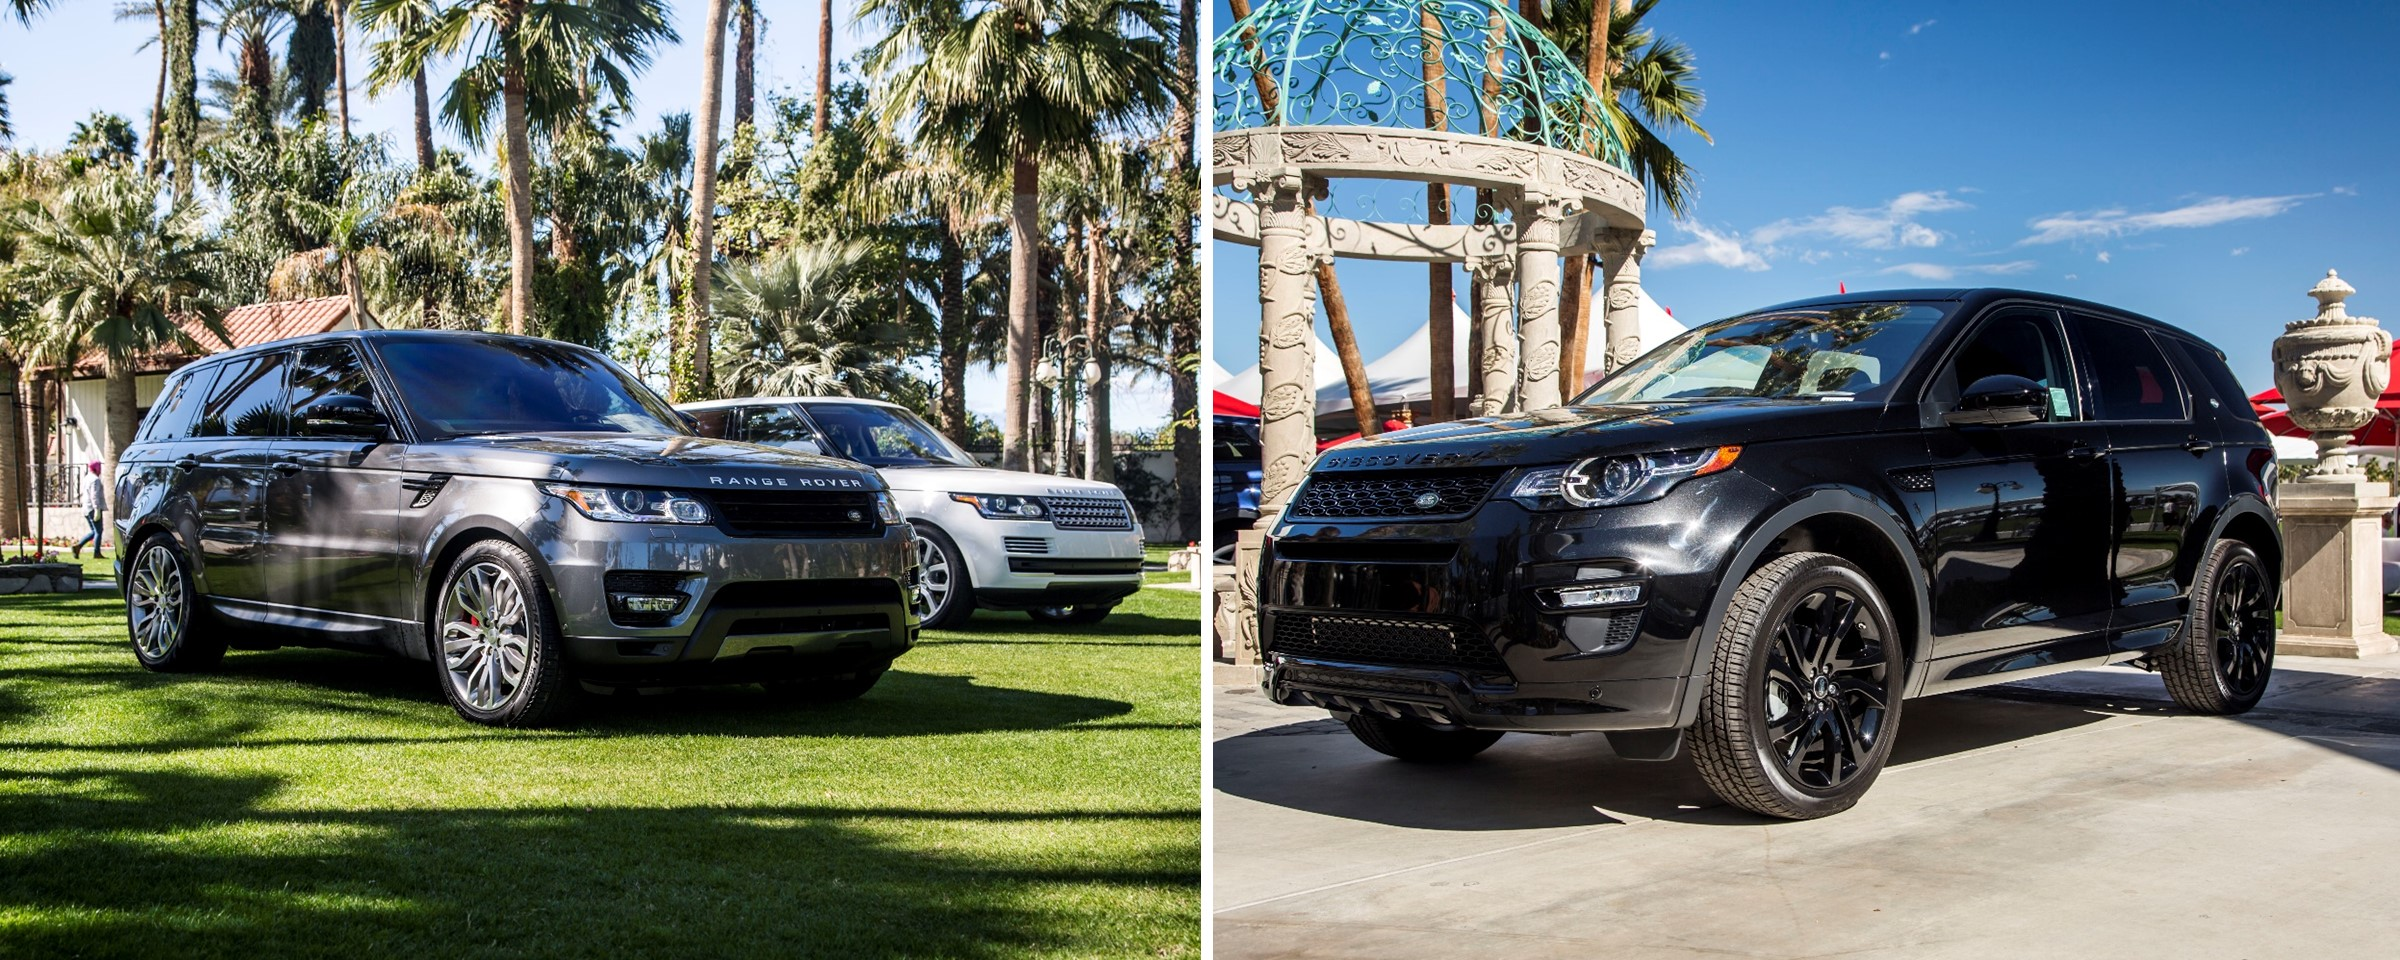 Land Rover Rancho Mirage Showcases New Models at Empire Polo Club